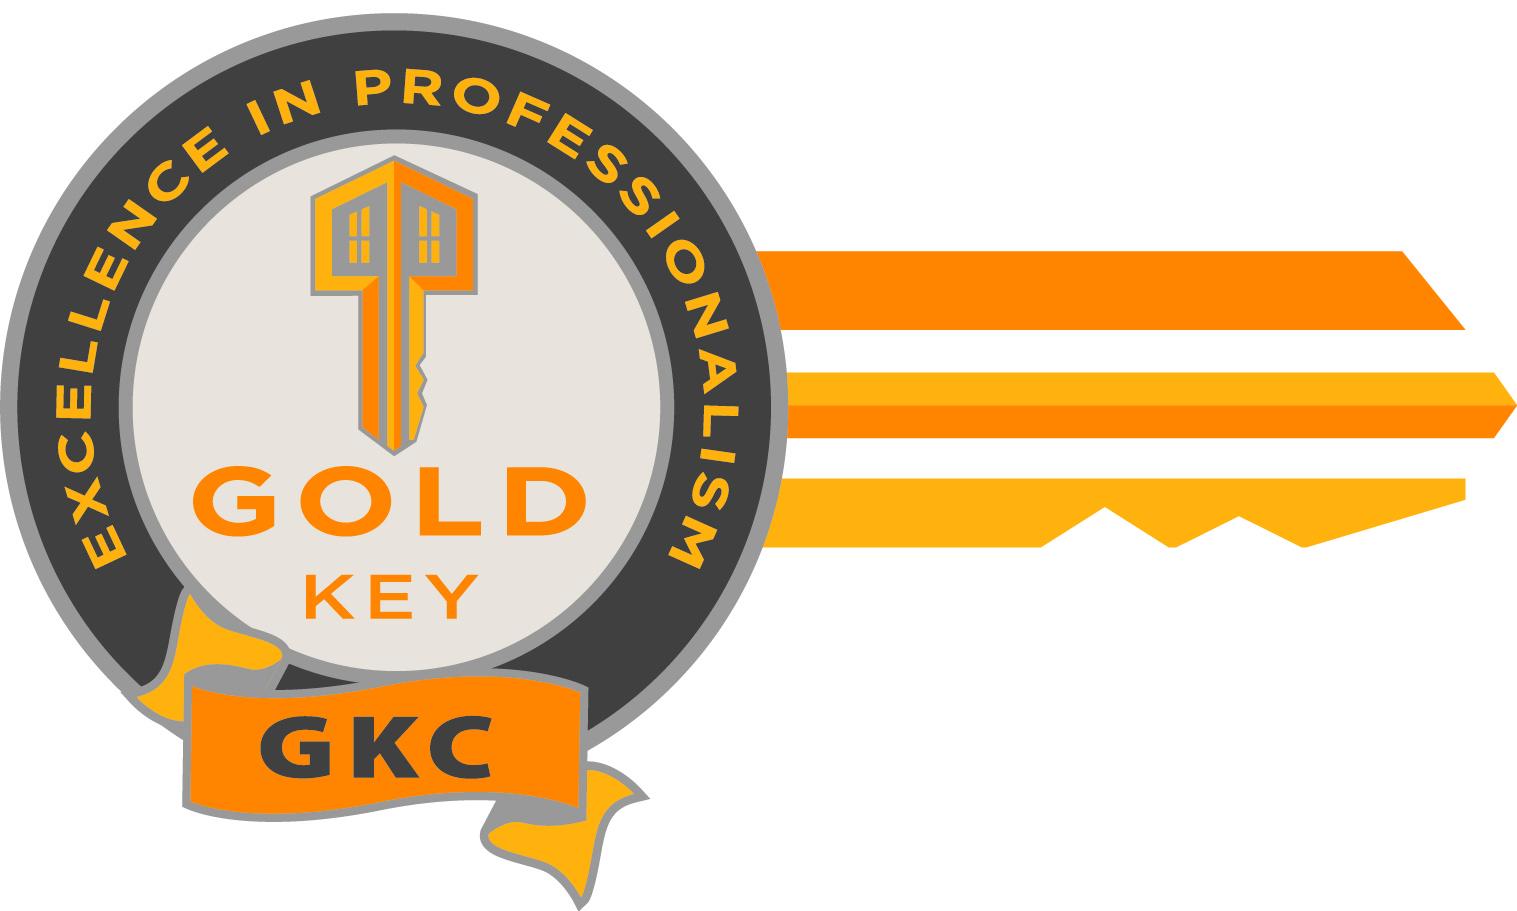 Gold Key Certification.jpg